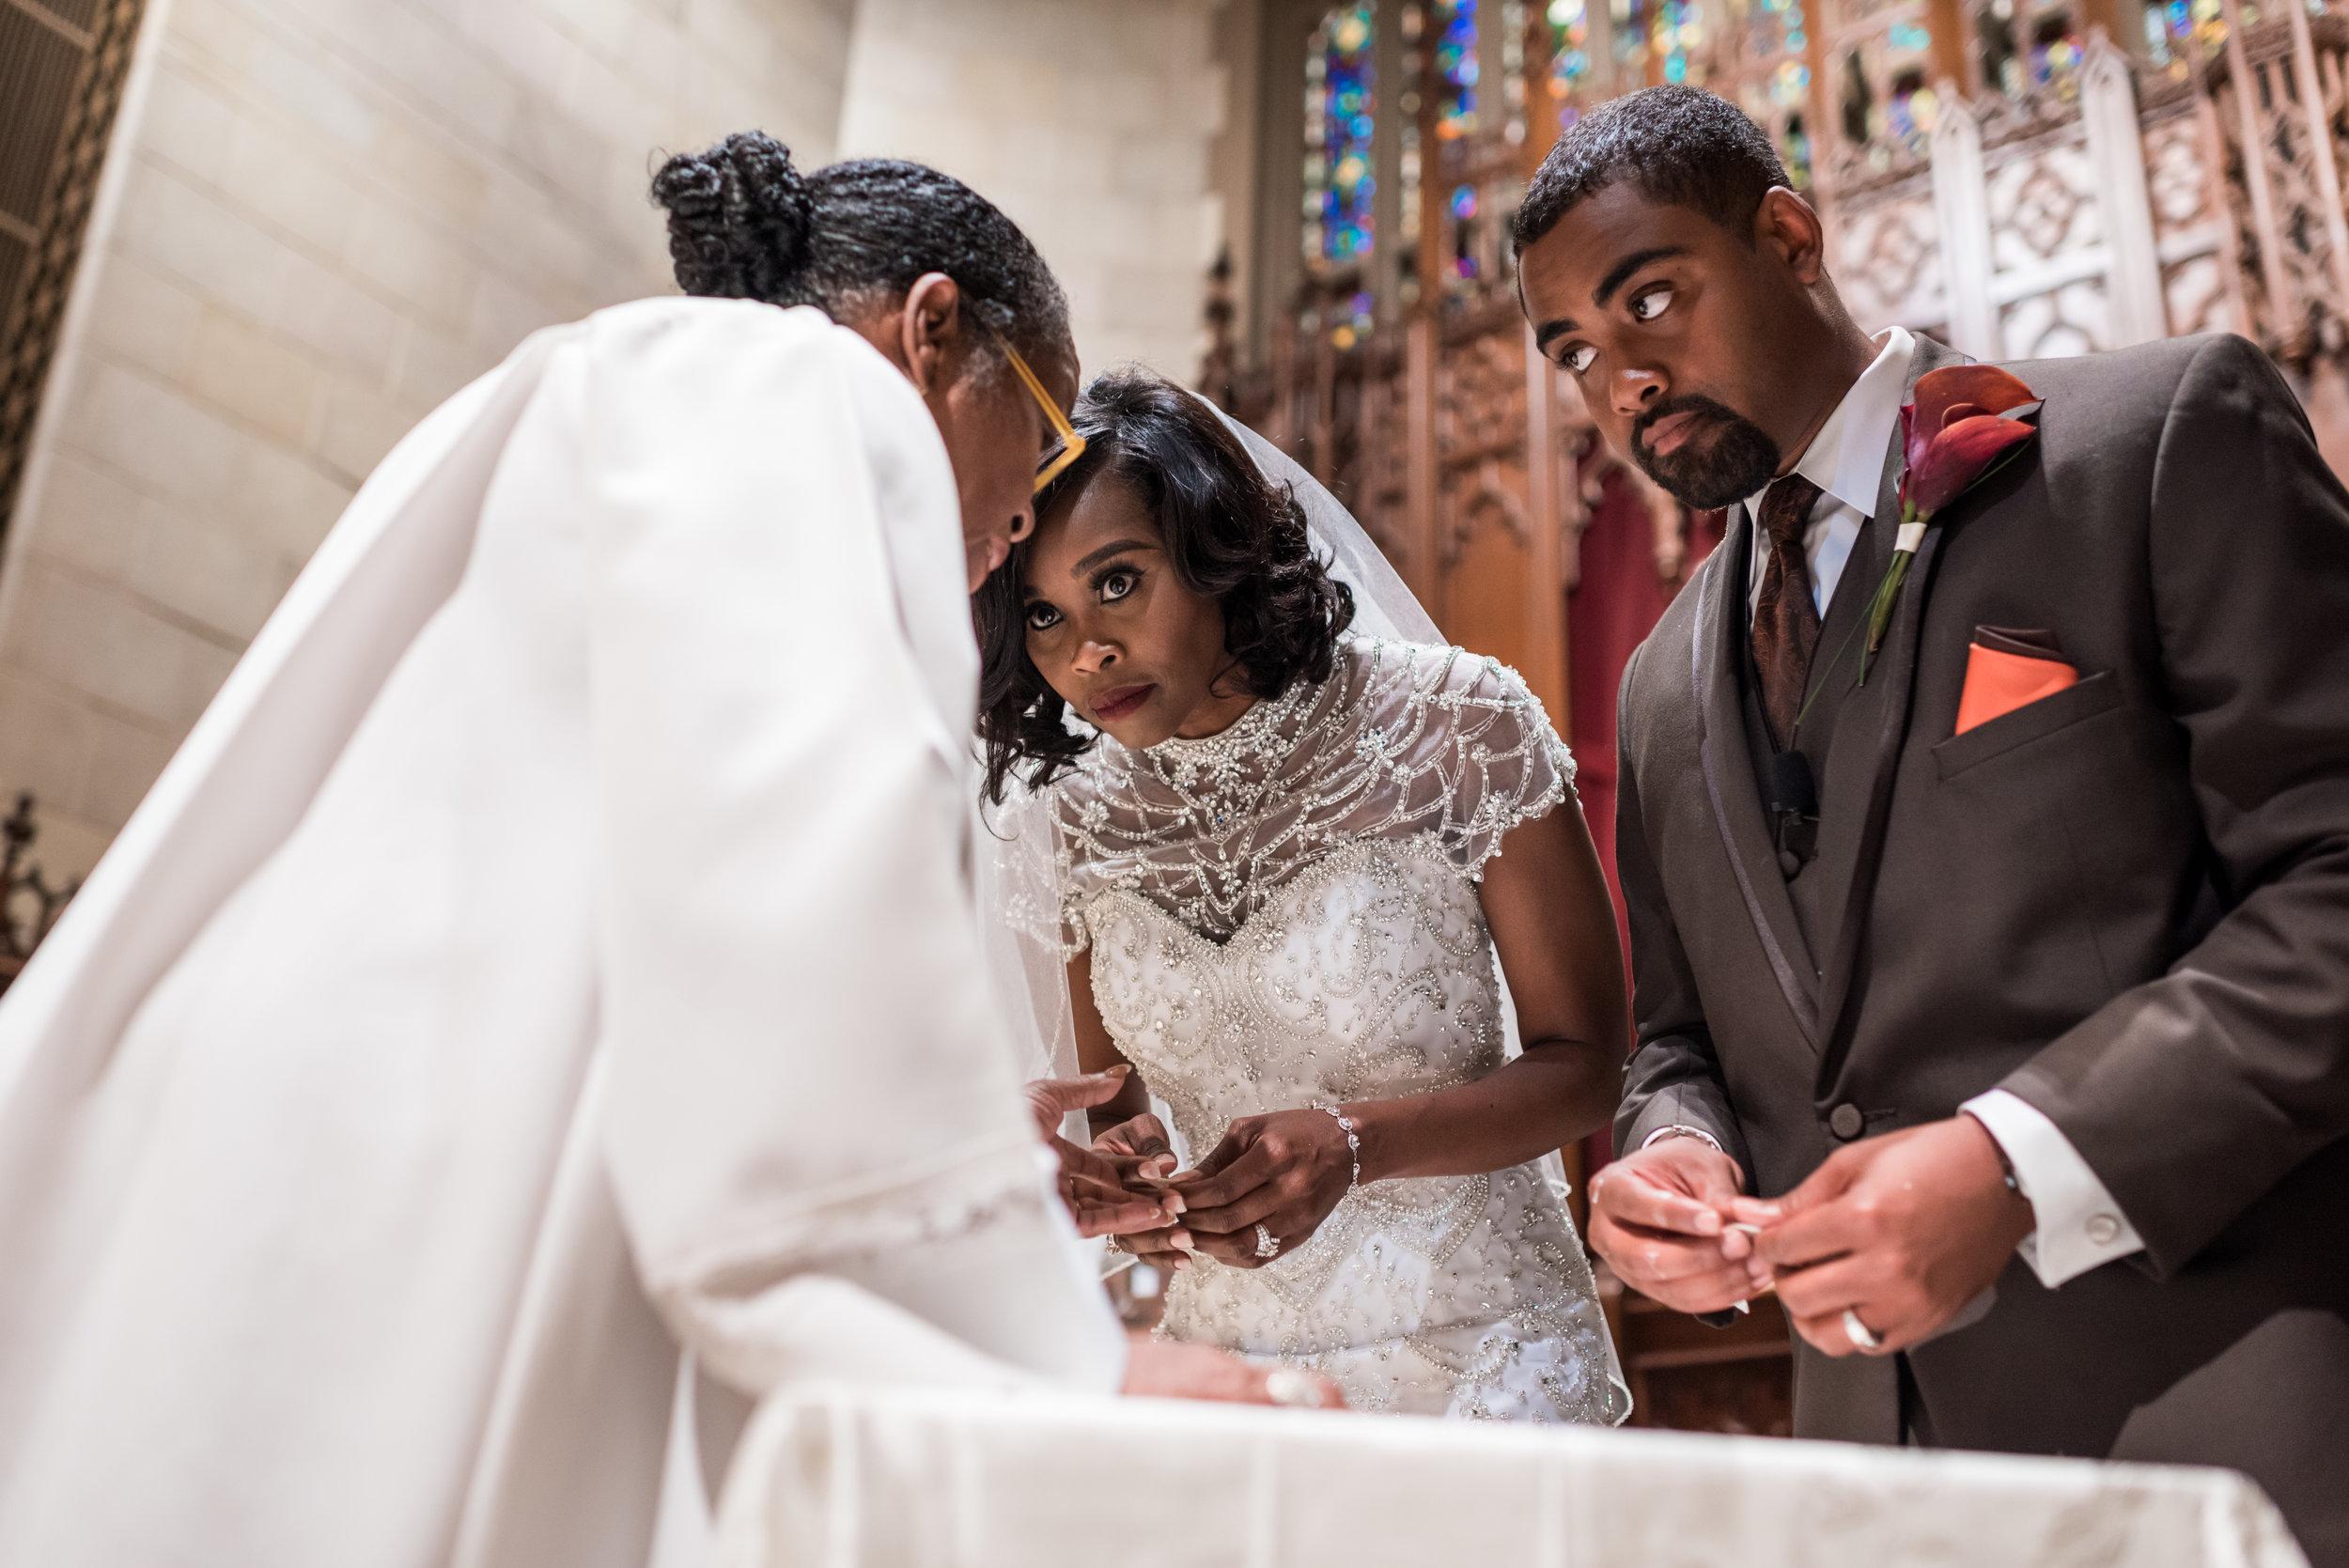 st-louis-wedding-photographer-third-baptist-church-418.jpg